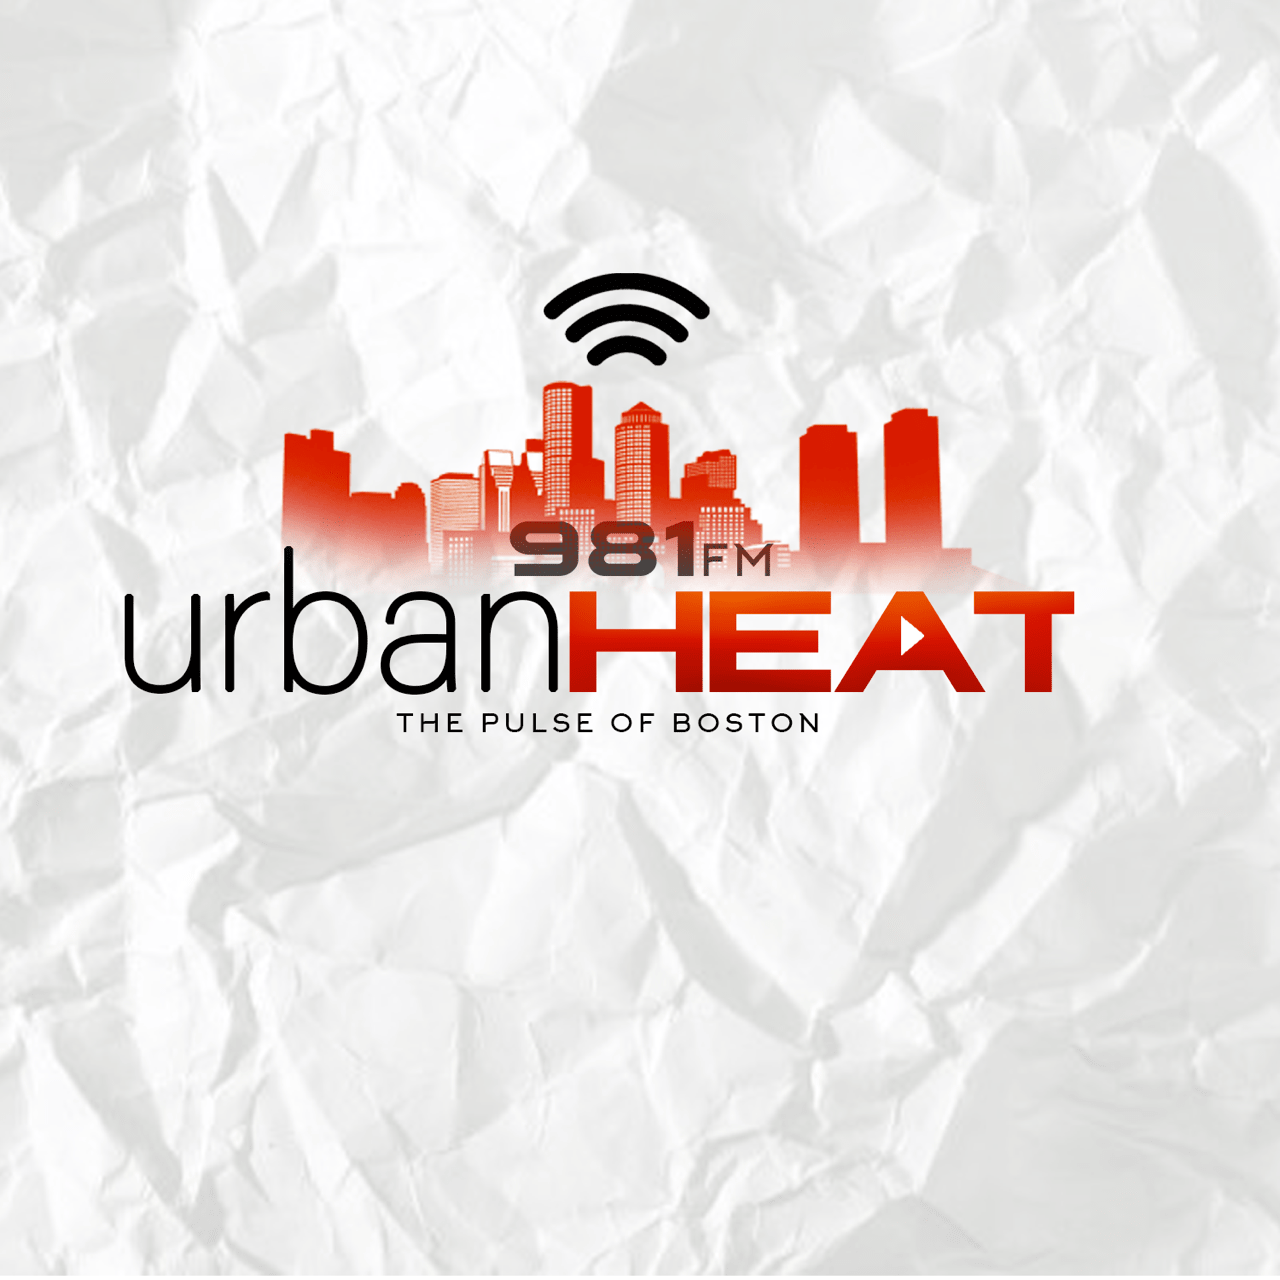 UrbanHeat 981